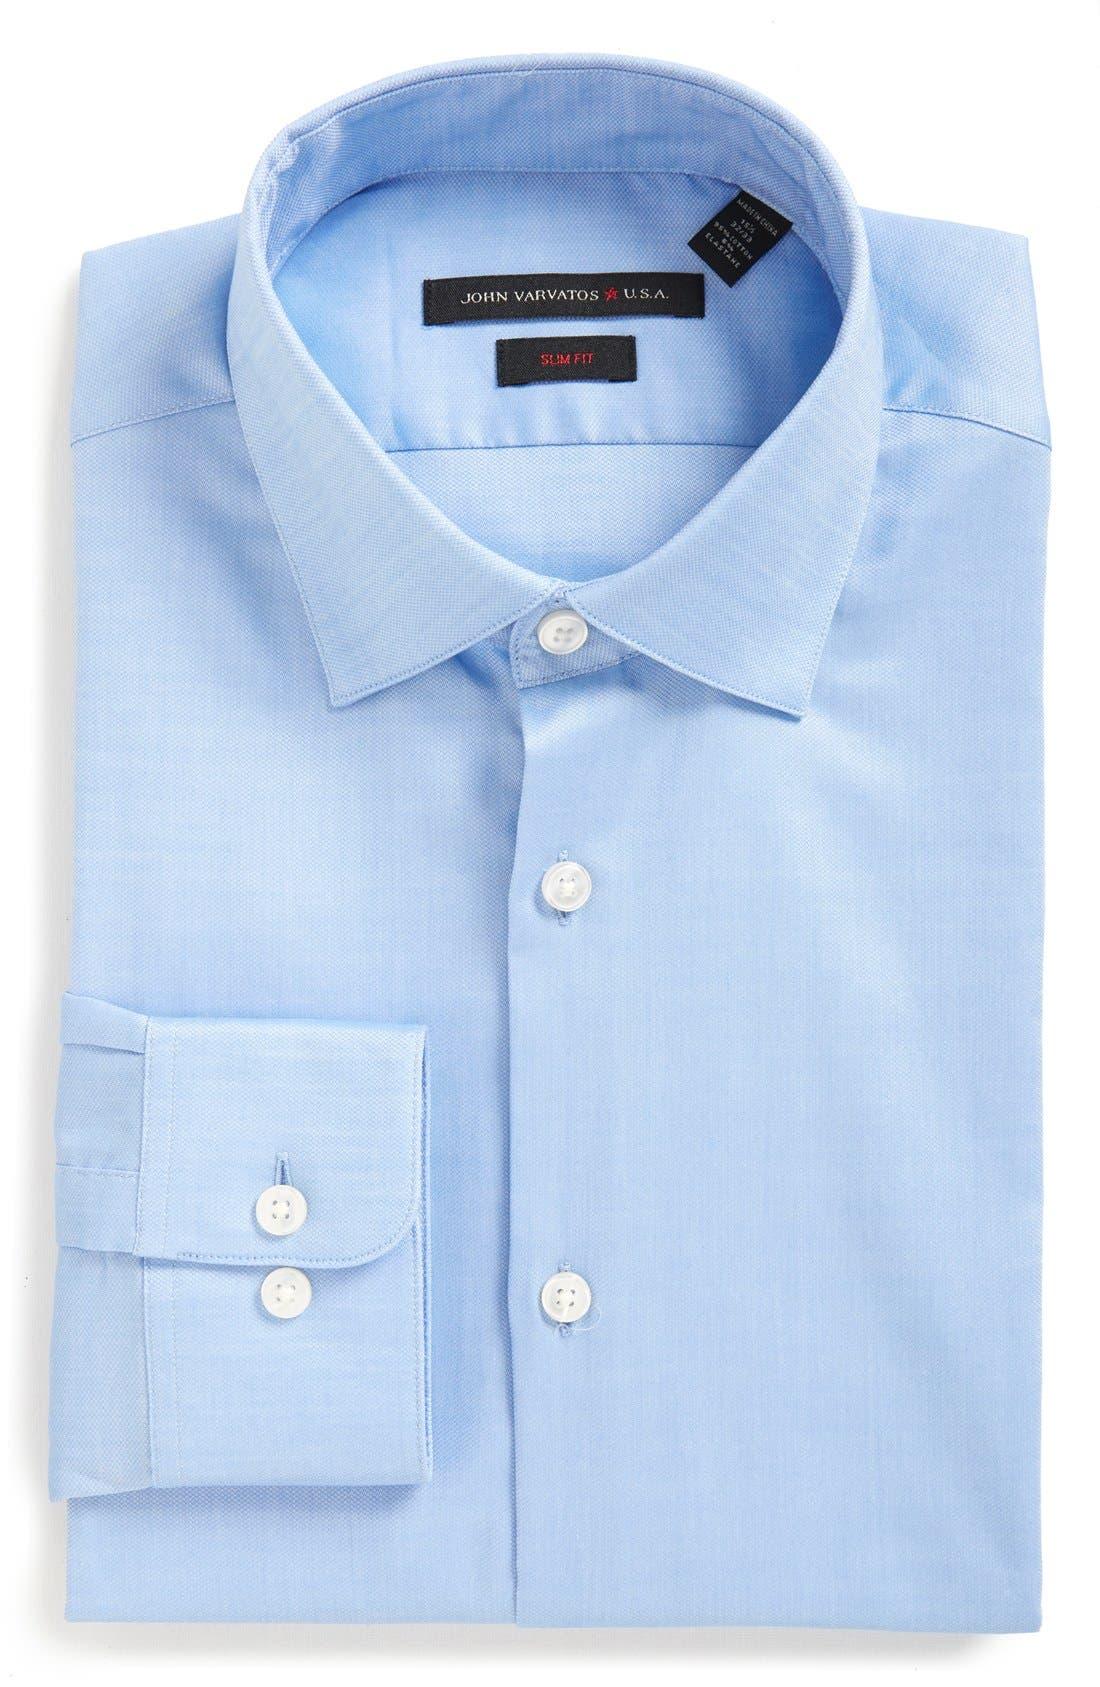 Soho Slim Fit Stretch Solid Dress Shirt,                             Main thumbnail 1, color,                             ATLANTIC BLUE